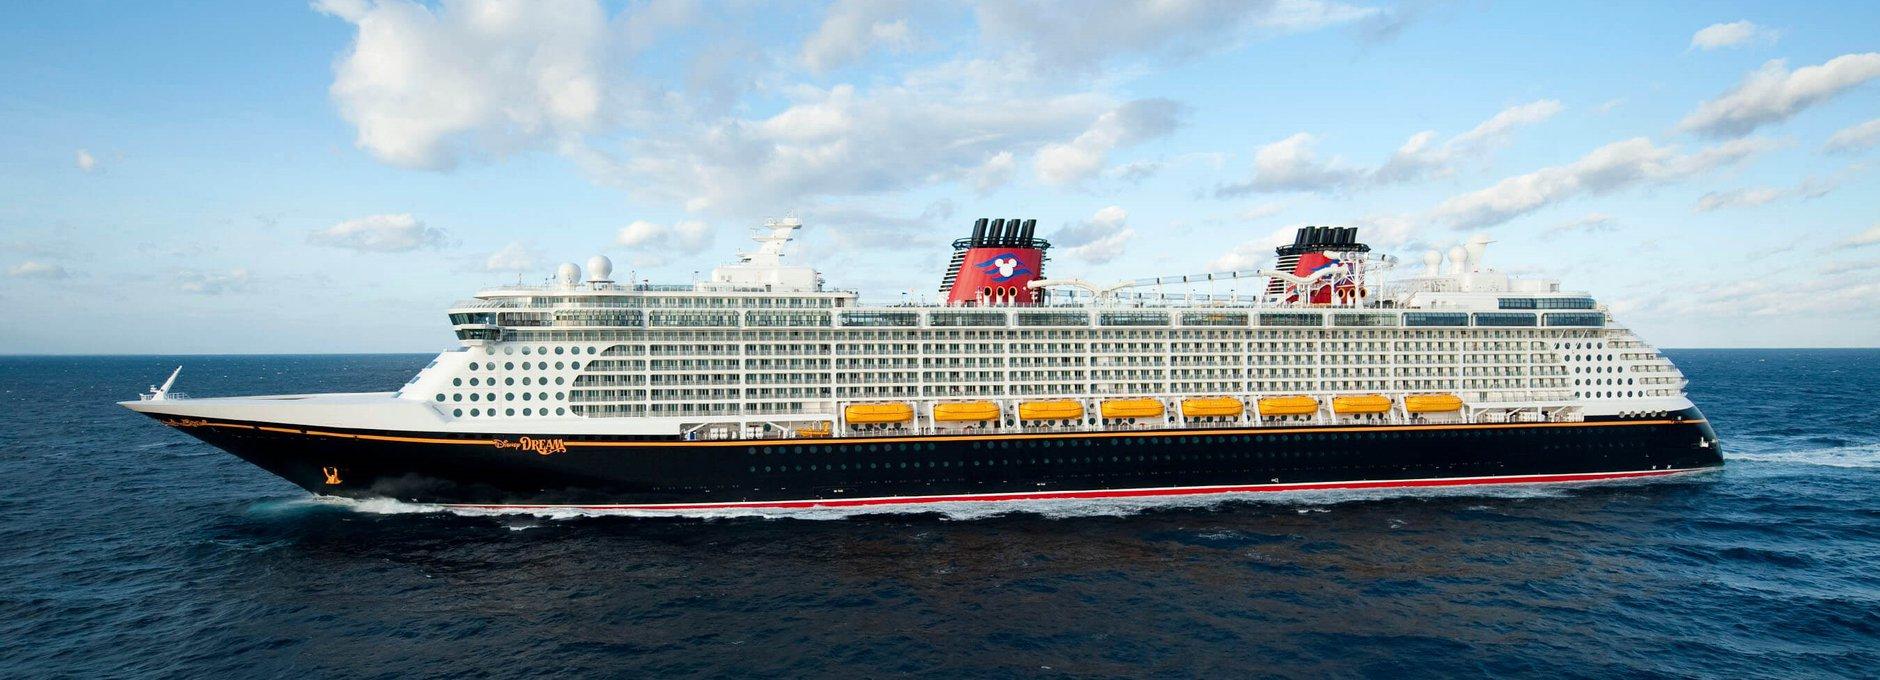 Disney-Cruises.jpg